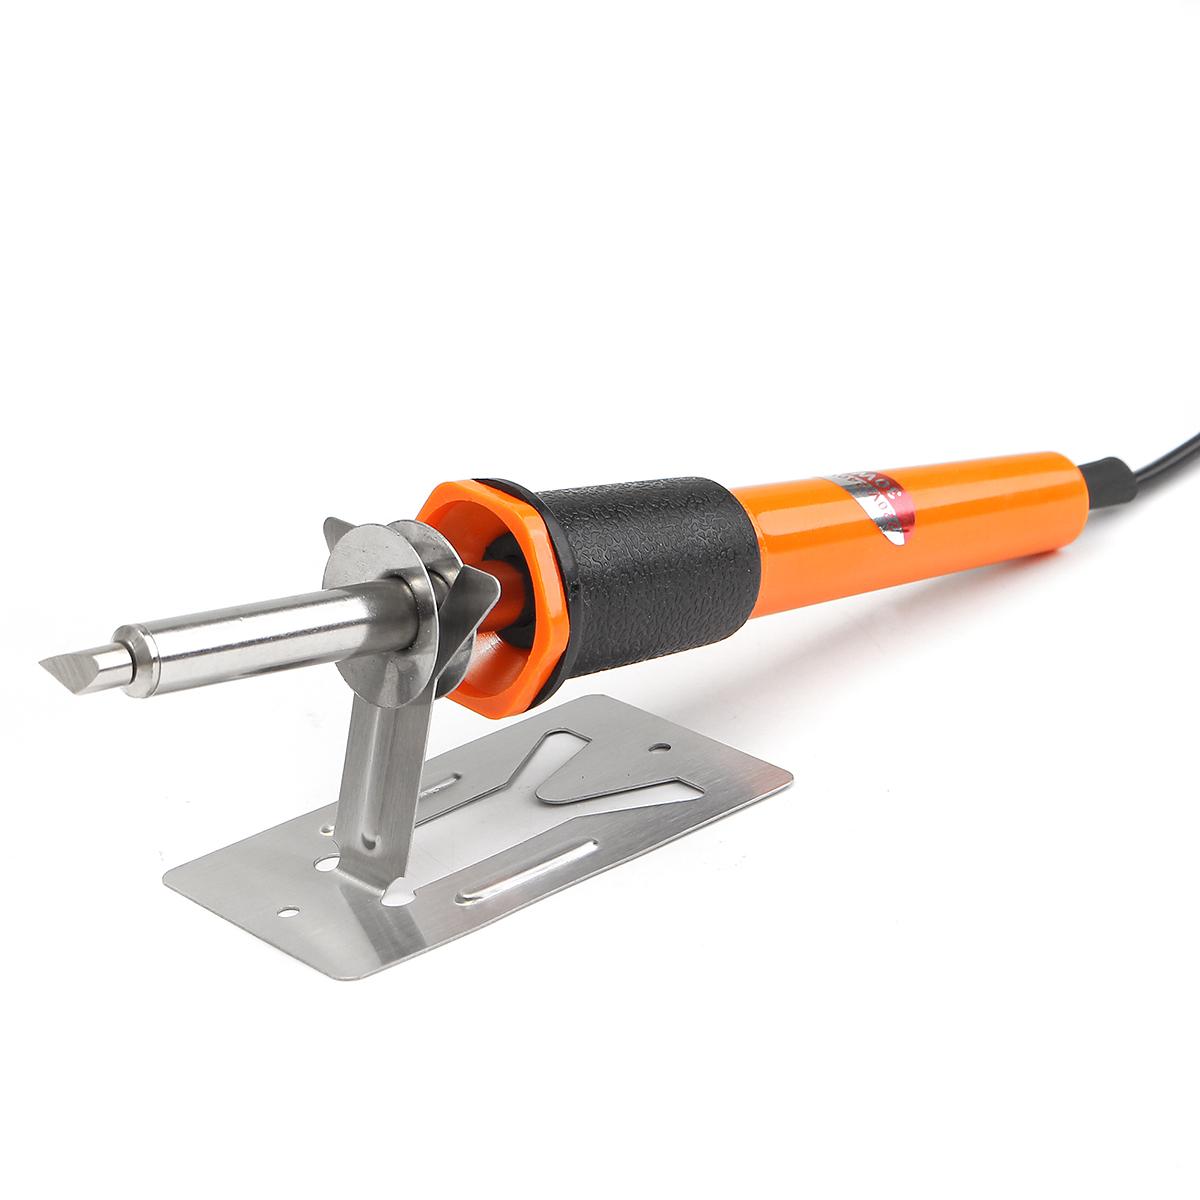 30W Pyrography Tool Wood Burning Iron Pen Set Kit with 22 Assorted Woodburning Tips